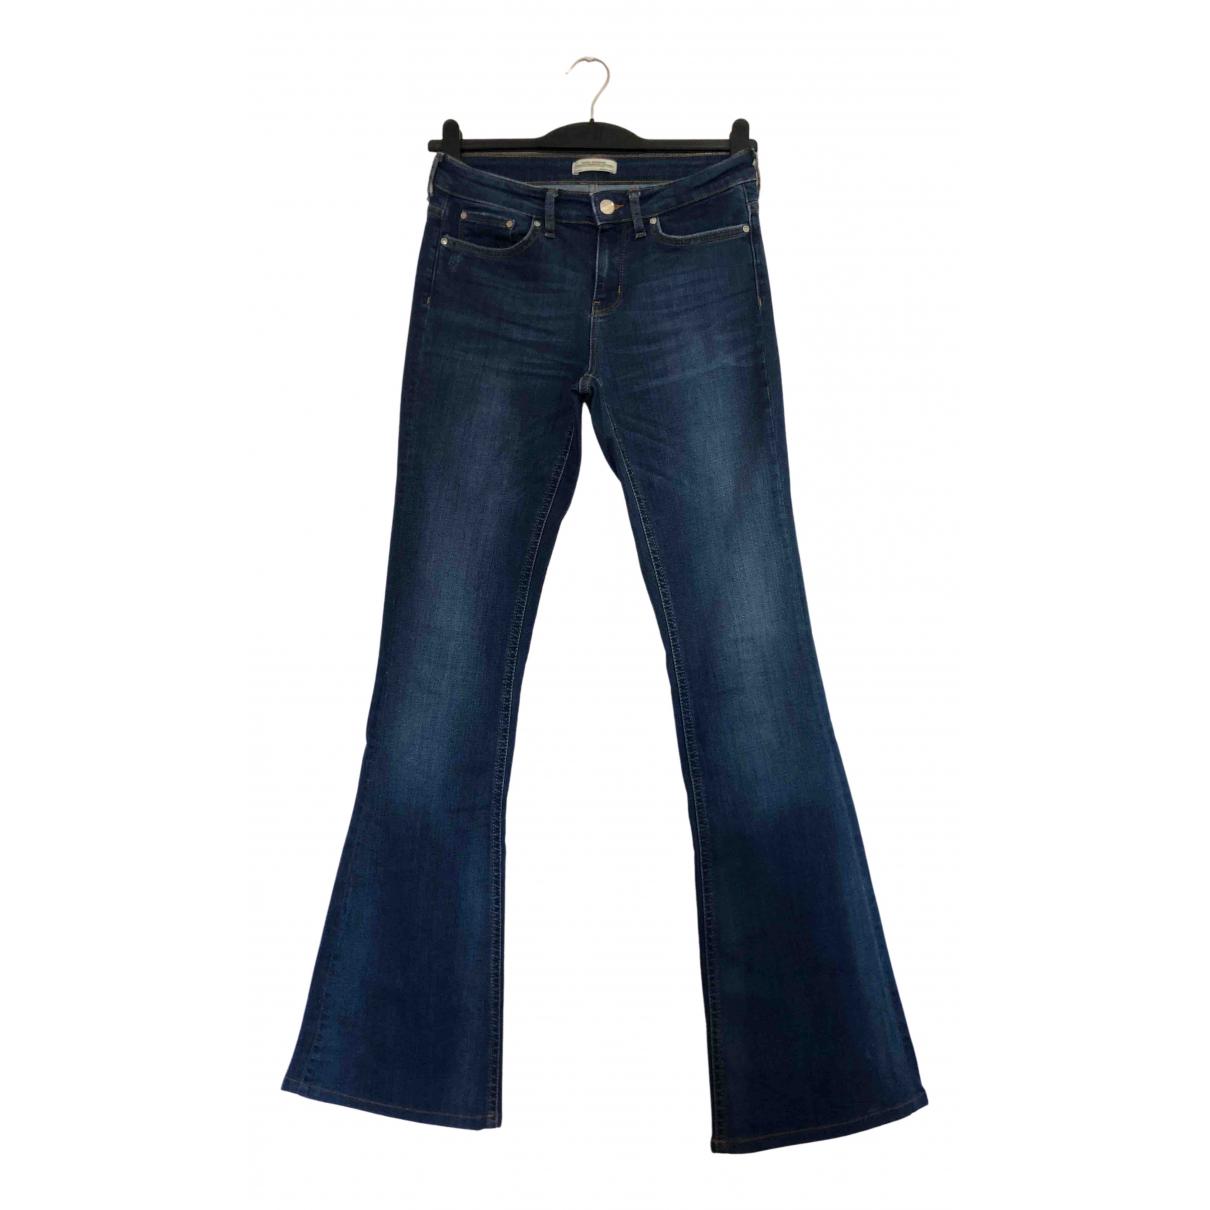 Zara N Blue Cotton - elasthane Jeans for Women 36 FR